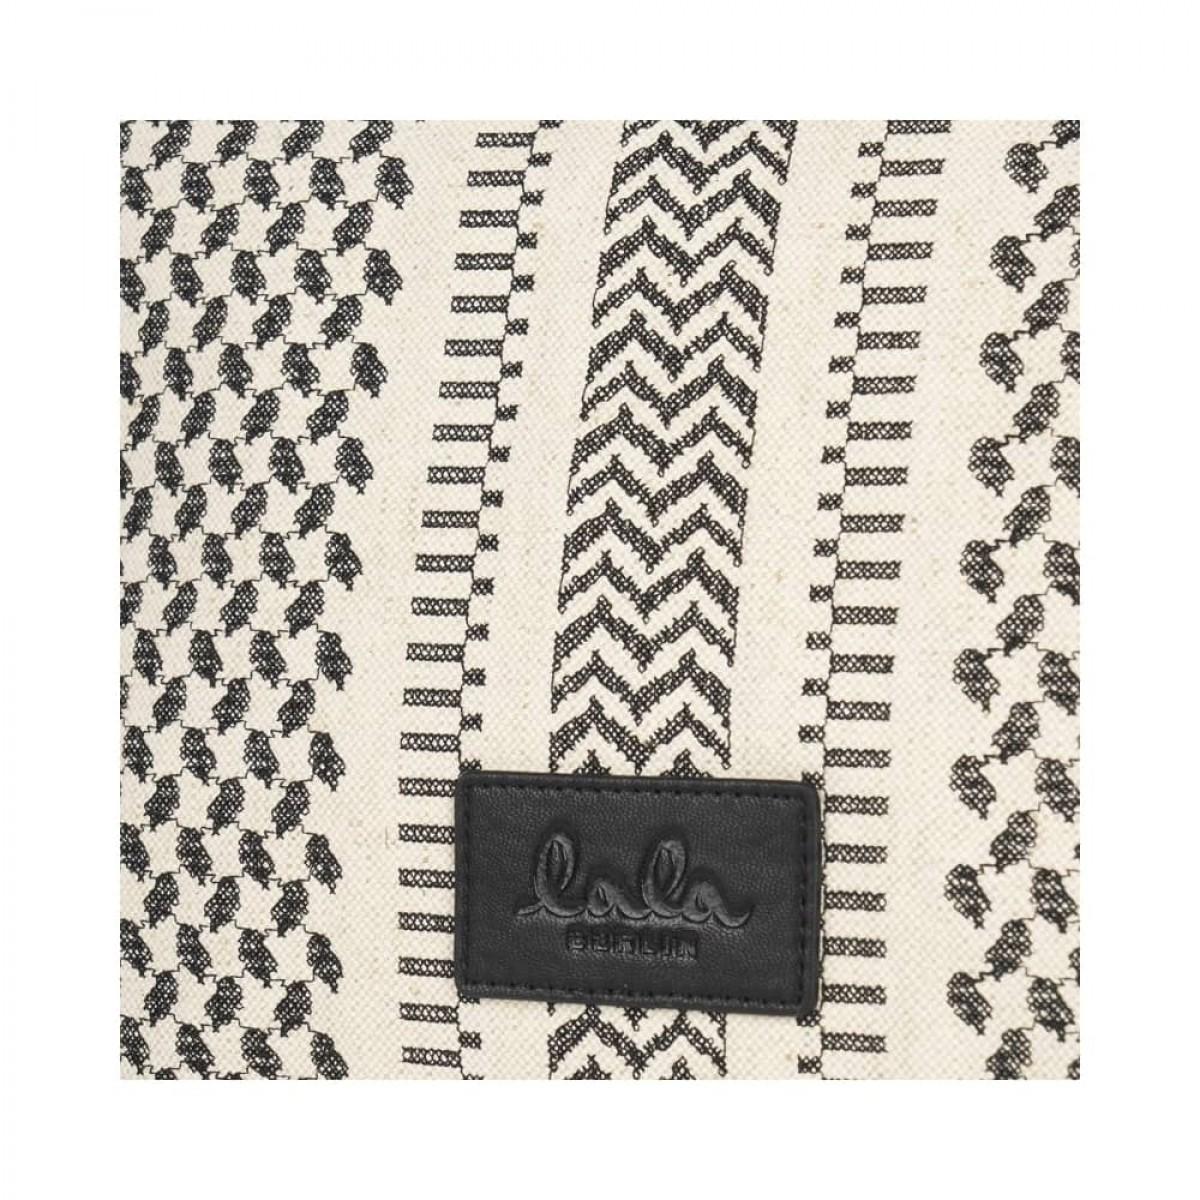 ew tote lauren x-stitch taske - black - logo detalje